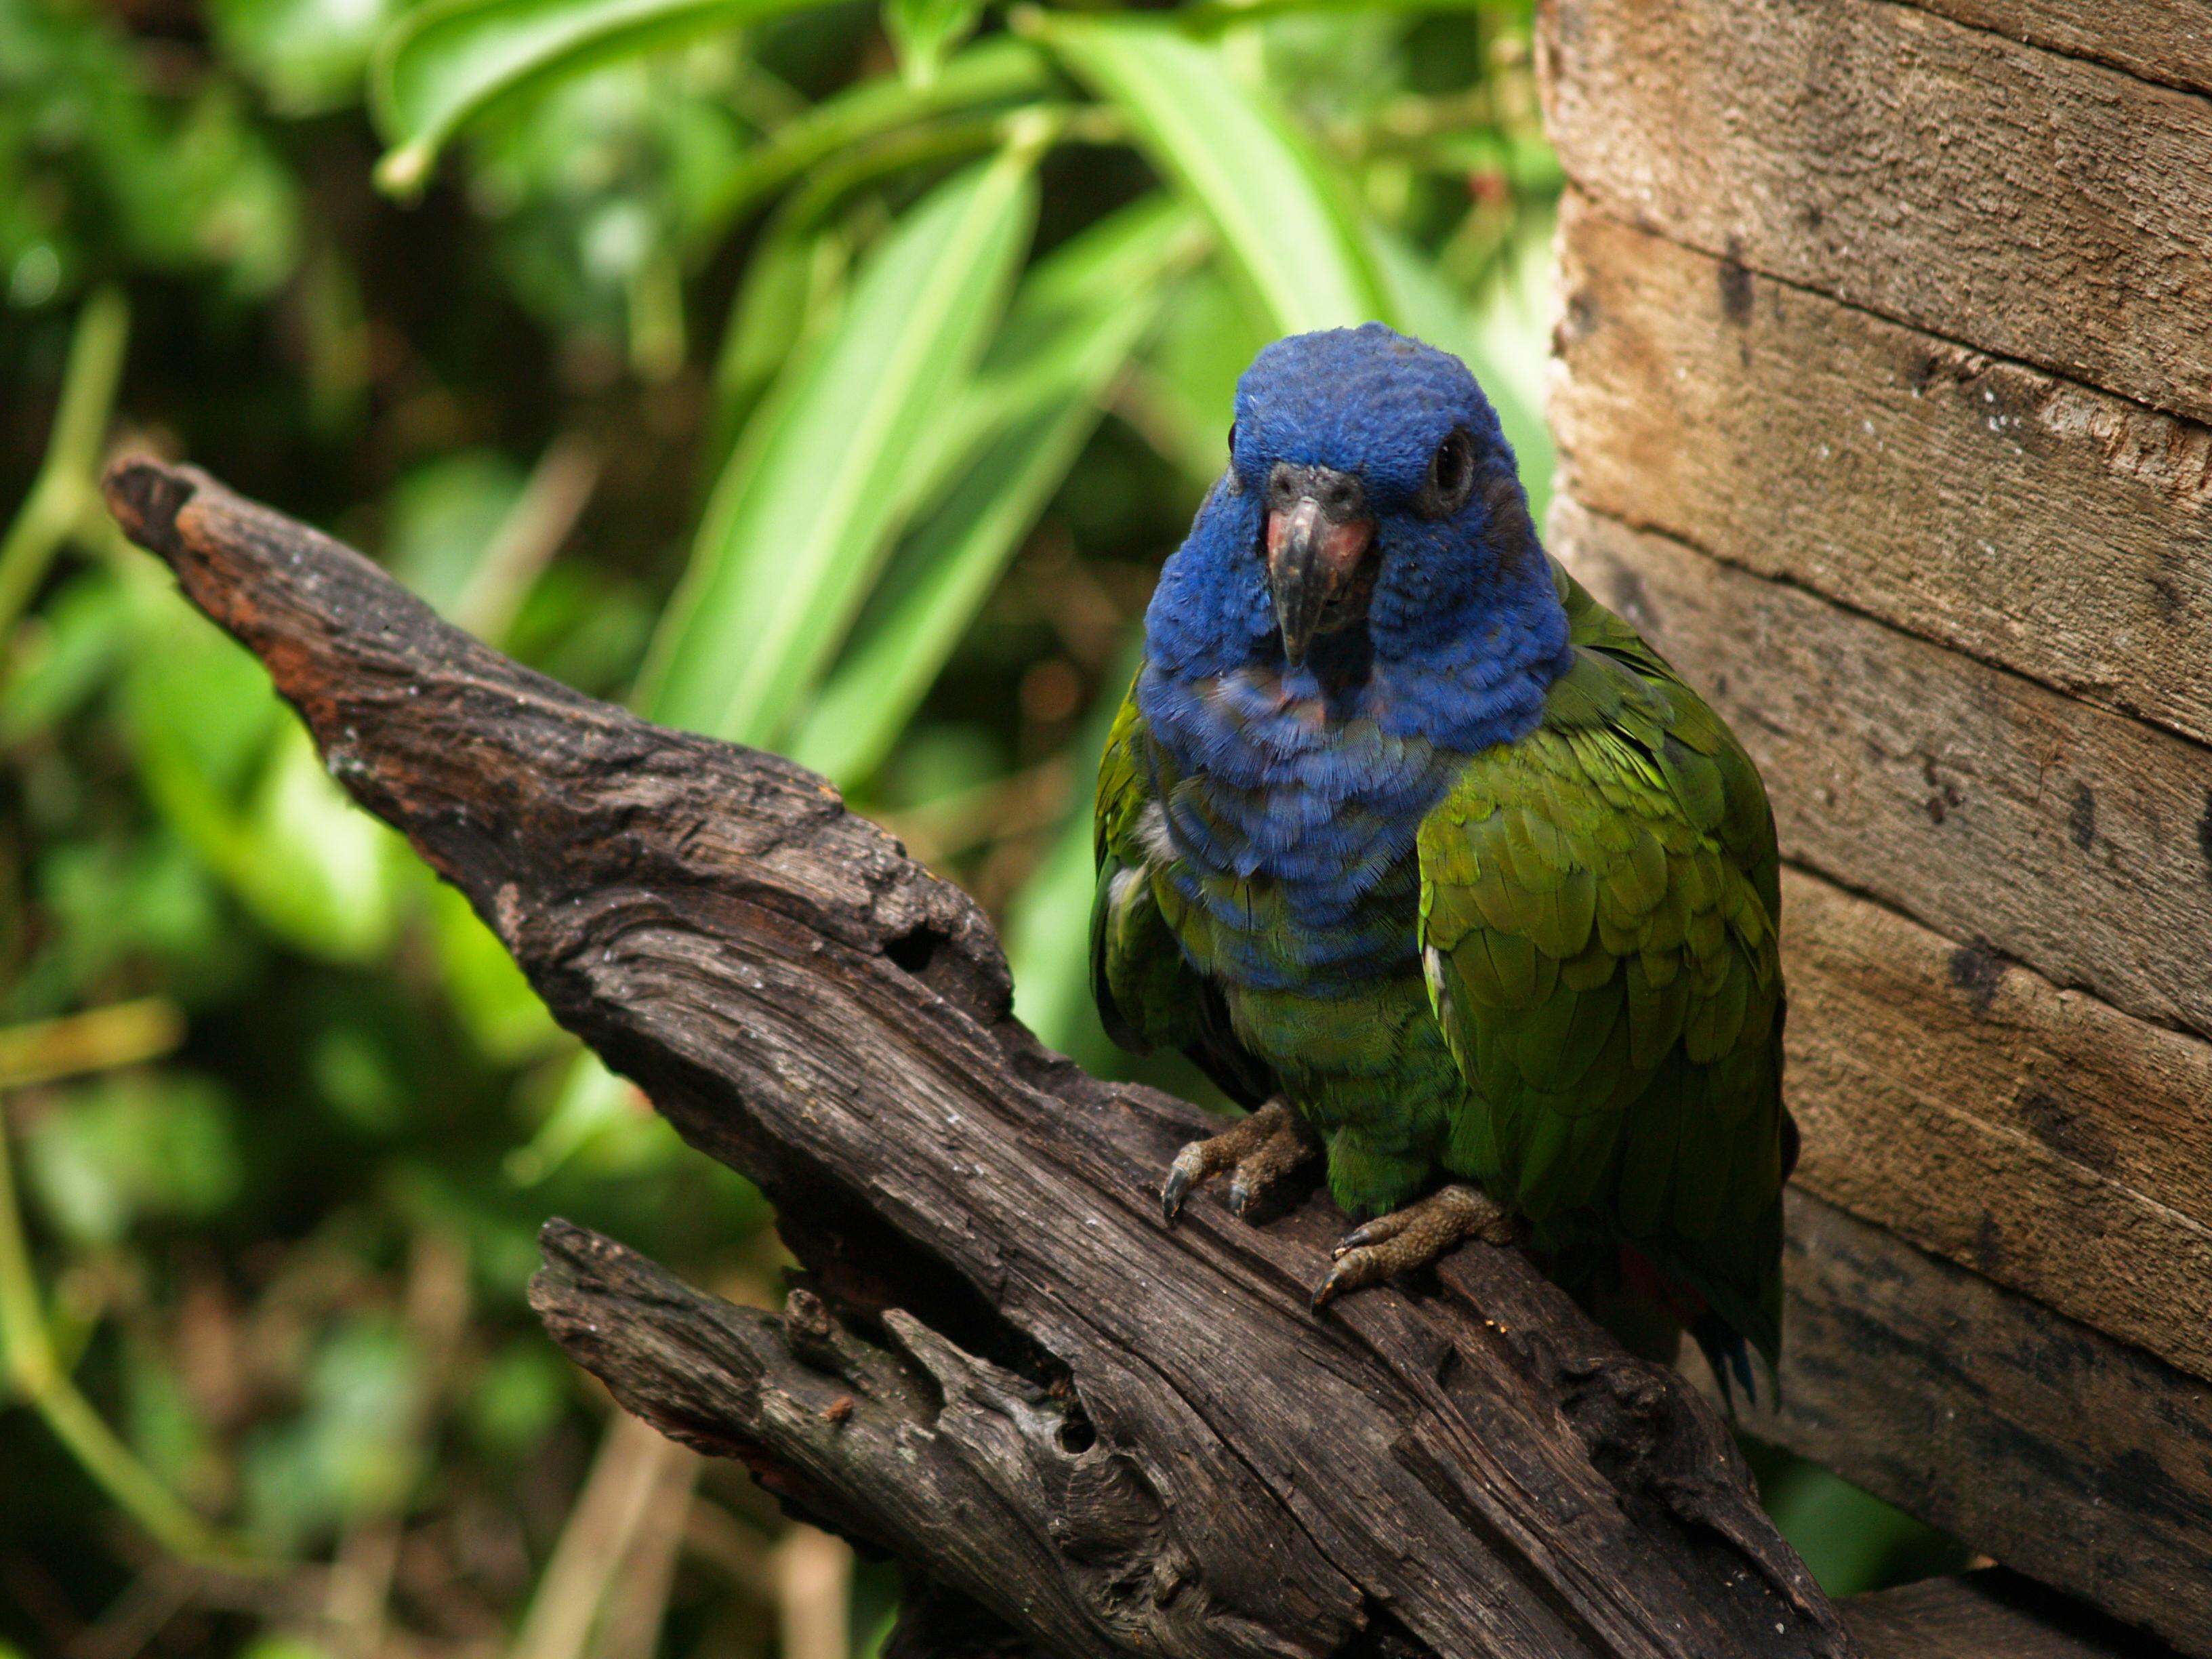 verde animal: